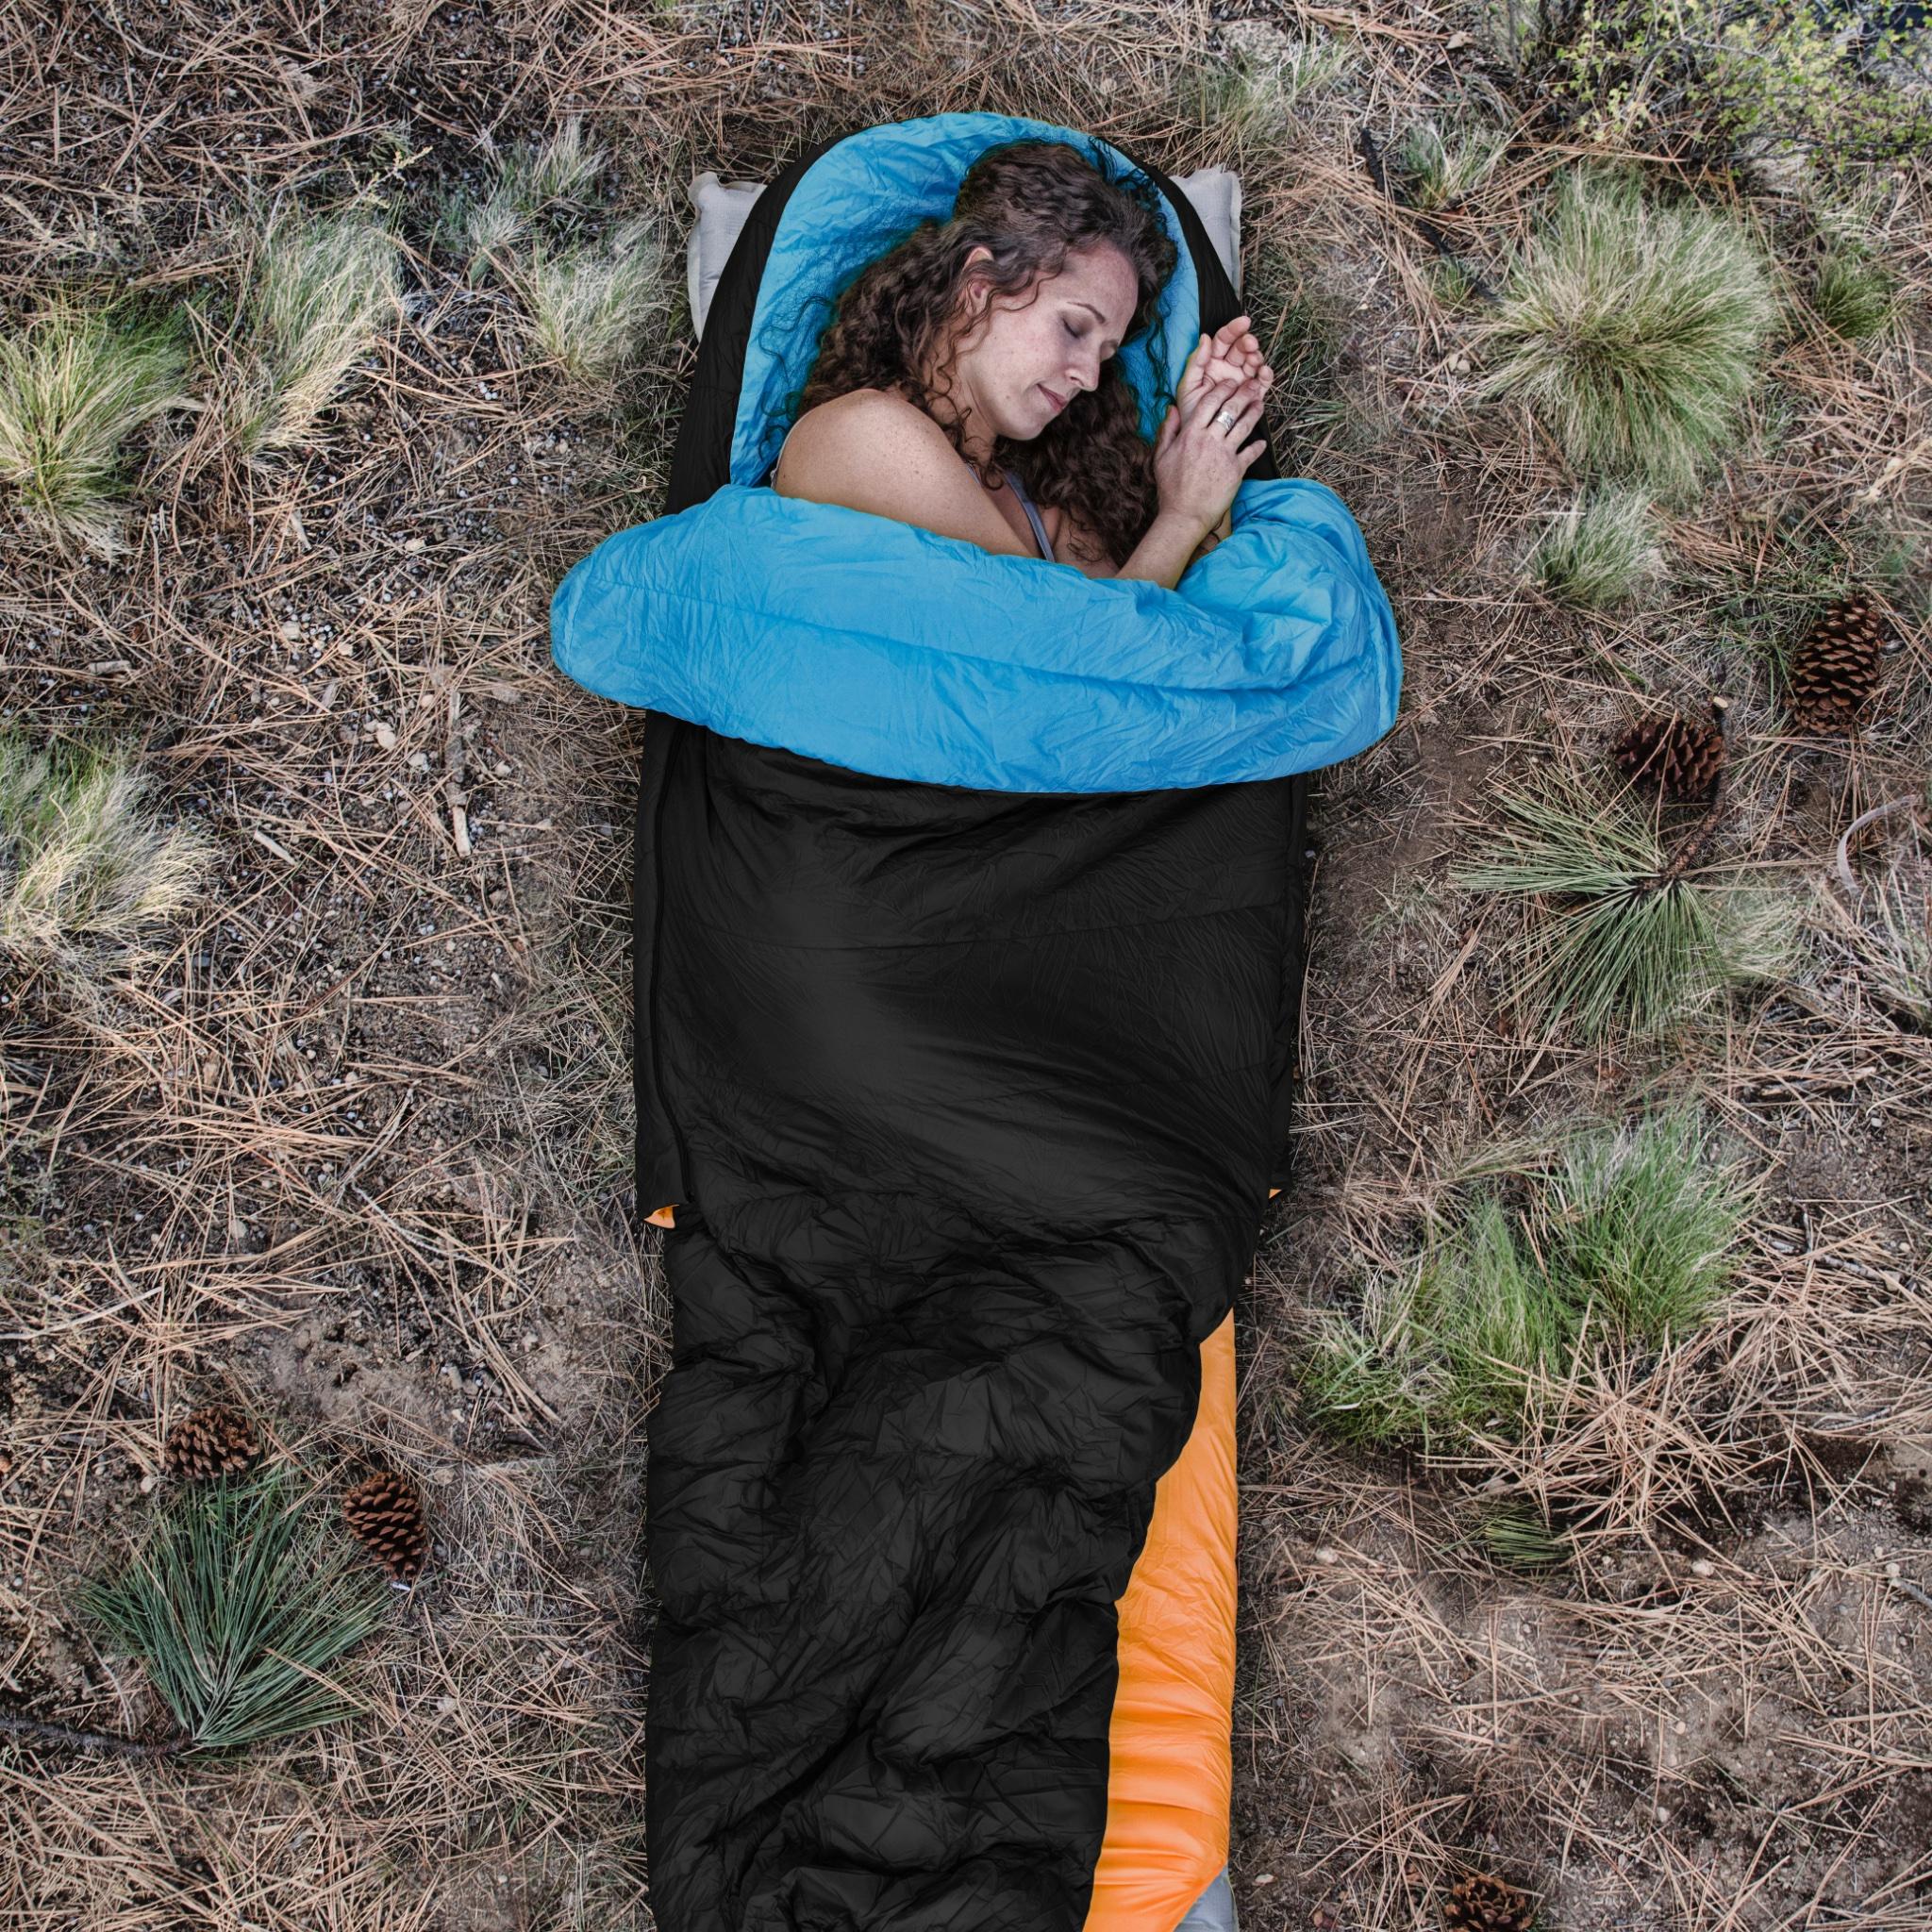 Woman sleeping outside on side in sleeping bag